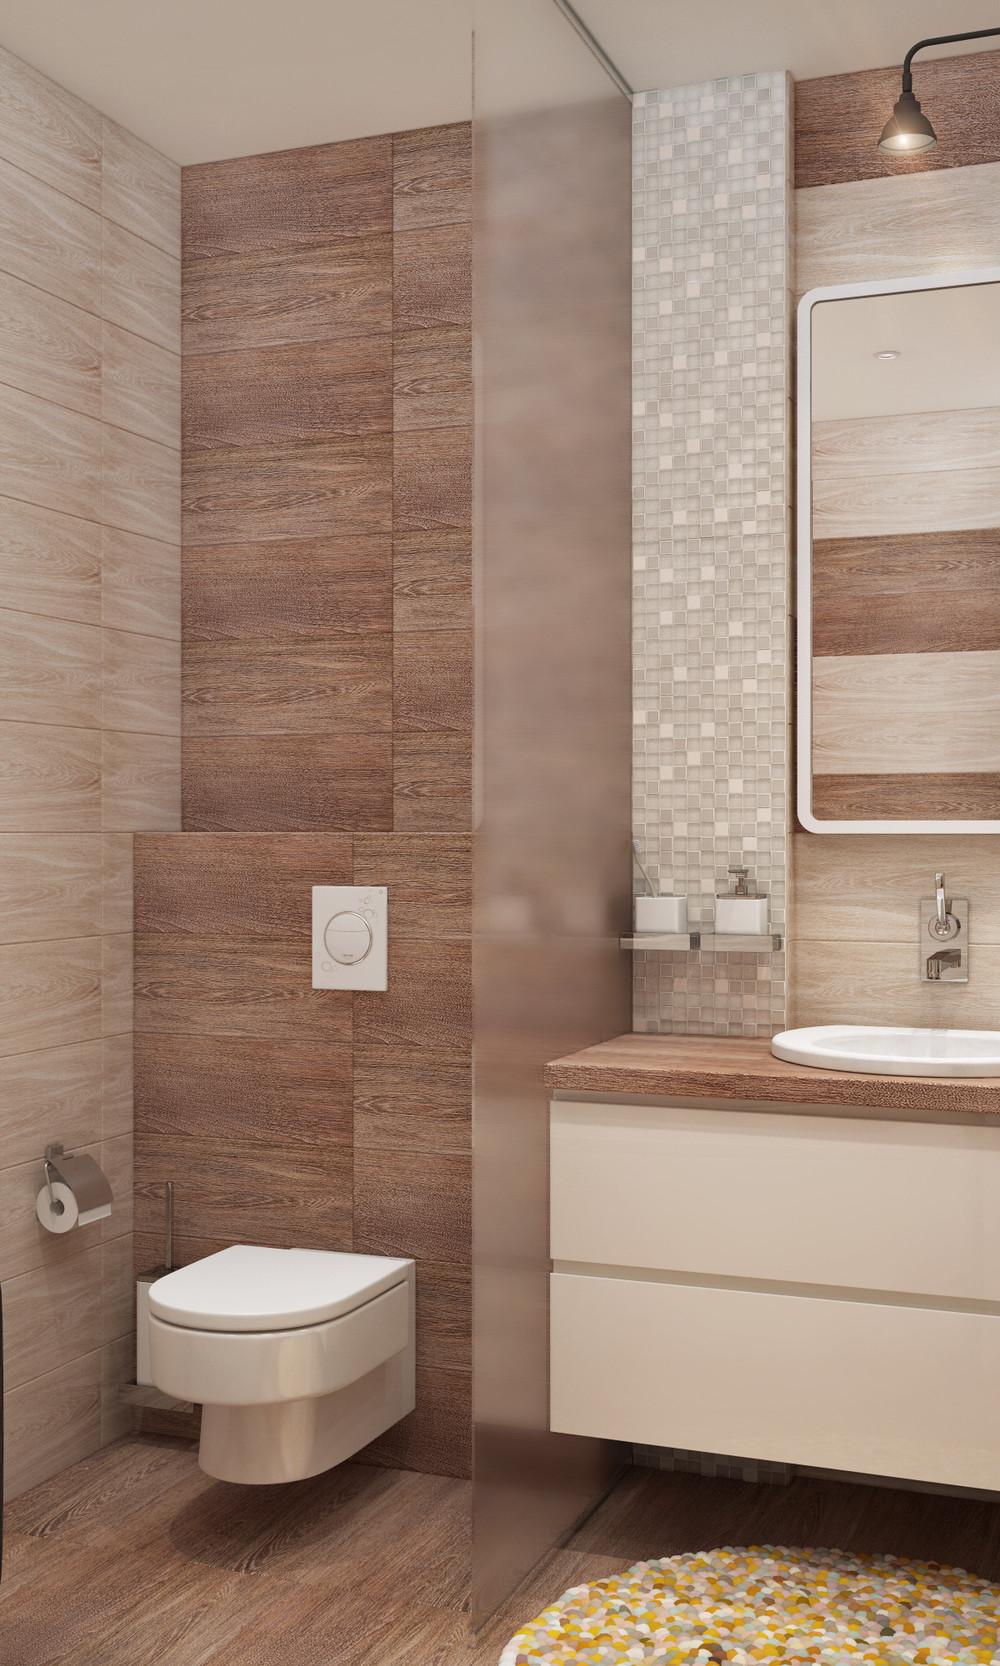 Luxury bathroom decorating ideas with beautiful a backsplash design looks so attractive - Bathroom design studio ...